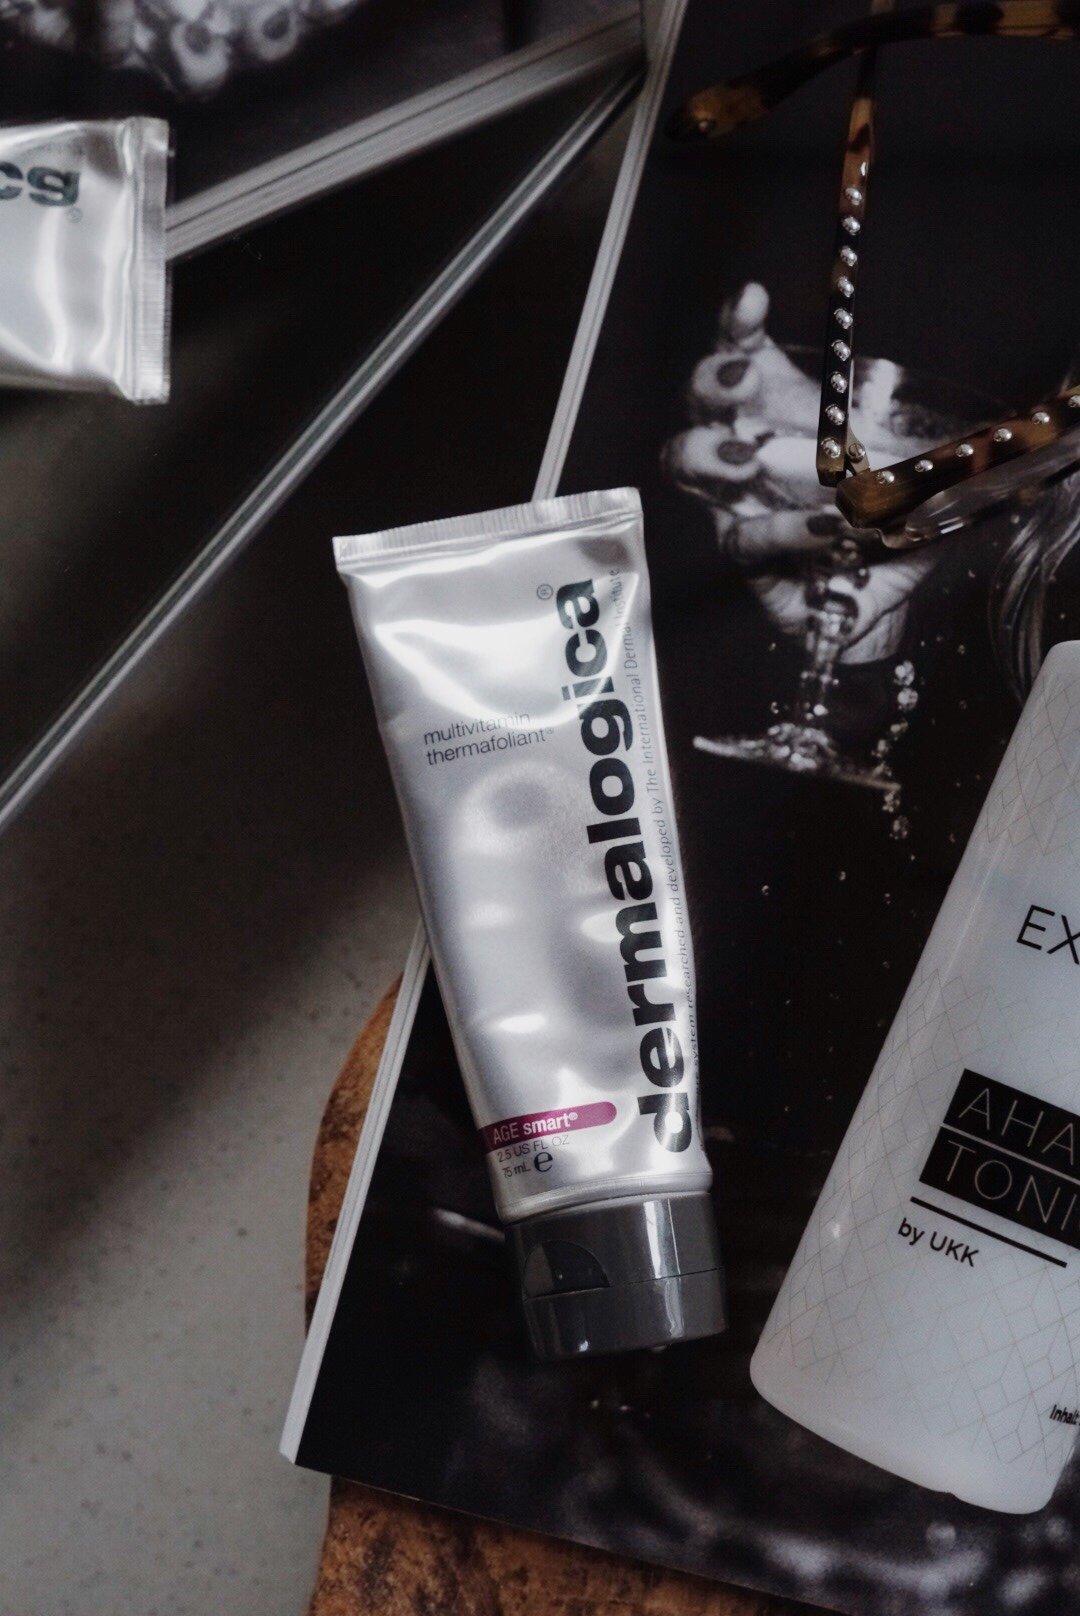 AHA und BHA Peeling - Fruchtsäure -Unterschiede - Tonic - Dermalogica Multivitamin Thermafoliant - Beauty Blog über 40